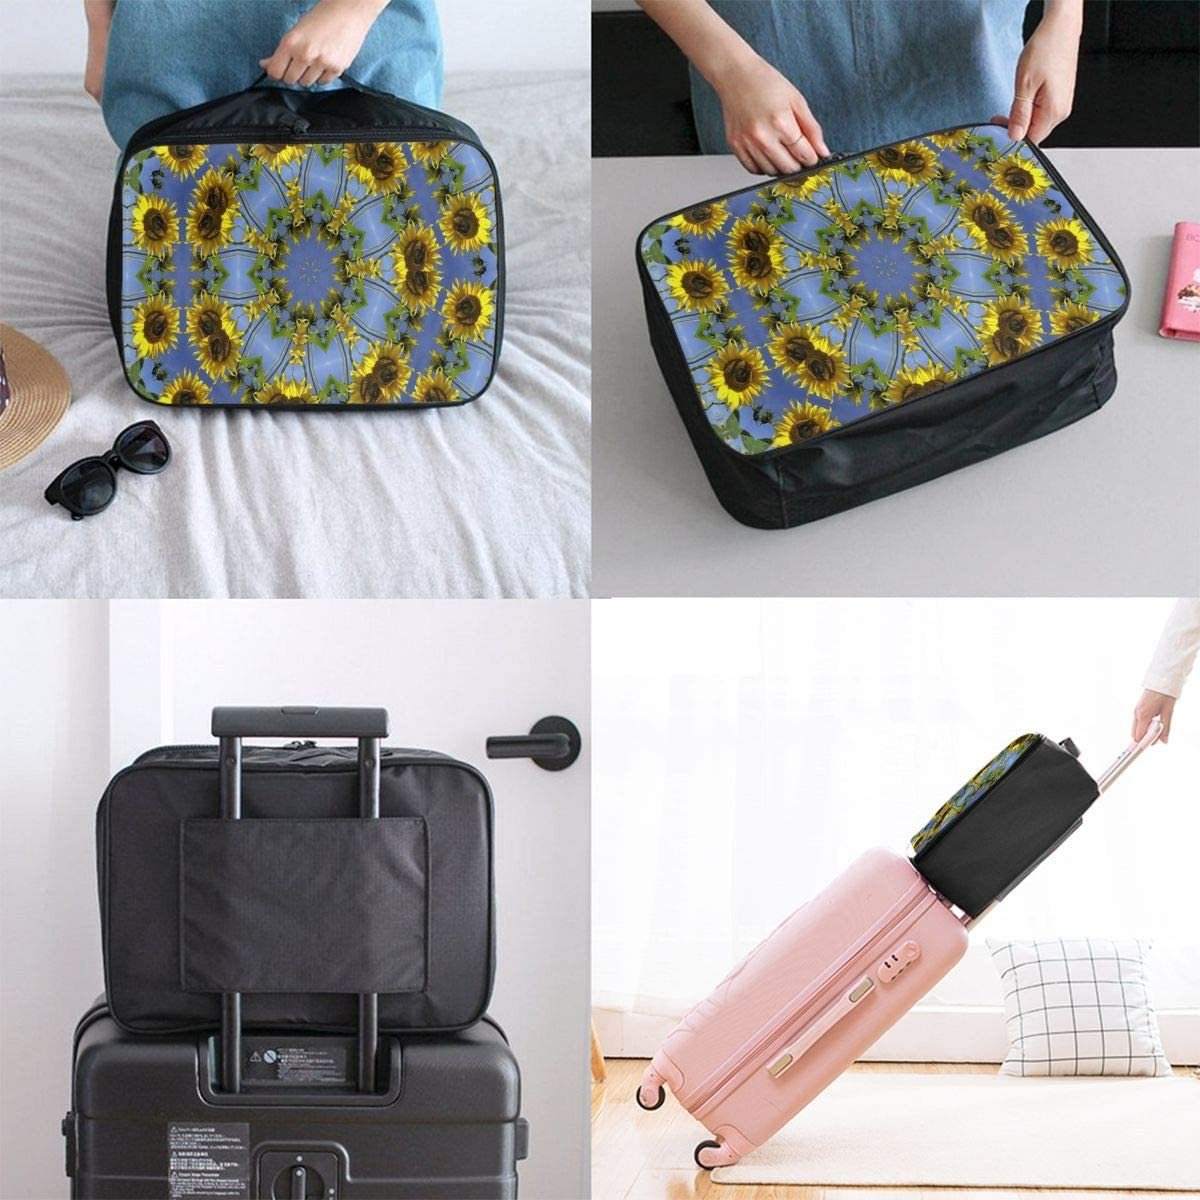 Yunshm Kaleidoscope Sunflowers Are Blooming Sky Personalized Trolley Handbag Waterproof Unisex Large Capacity For Business Travel Storage